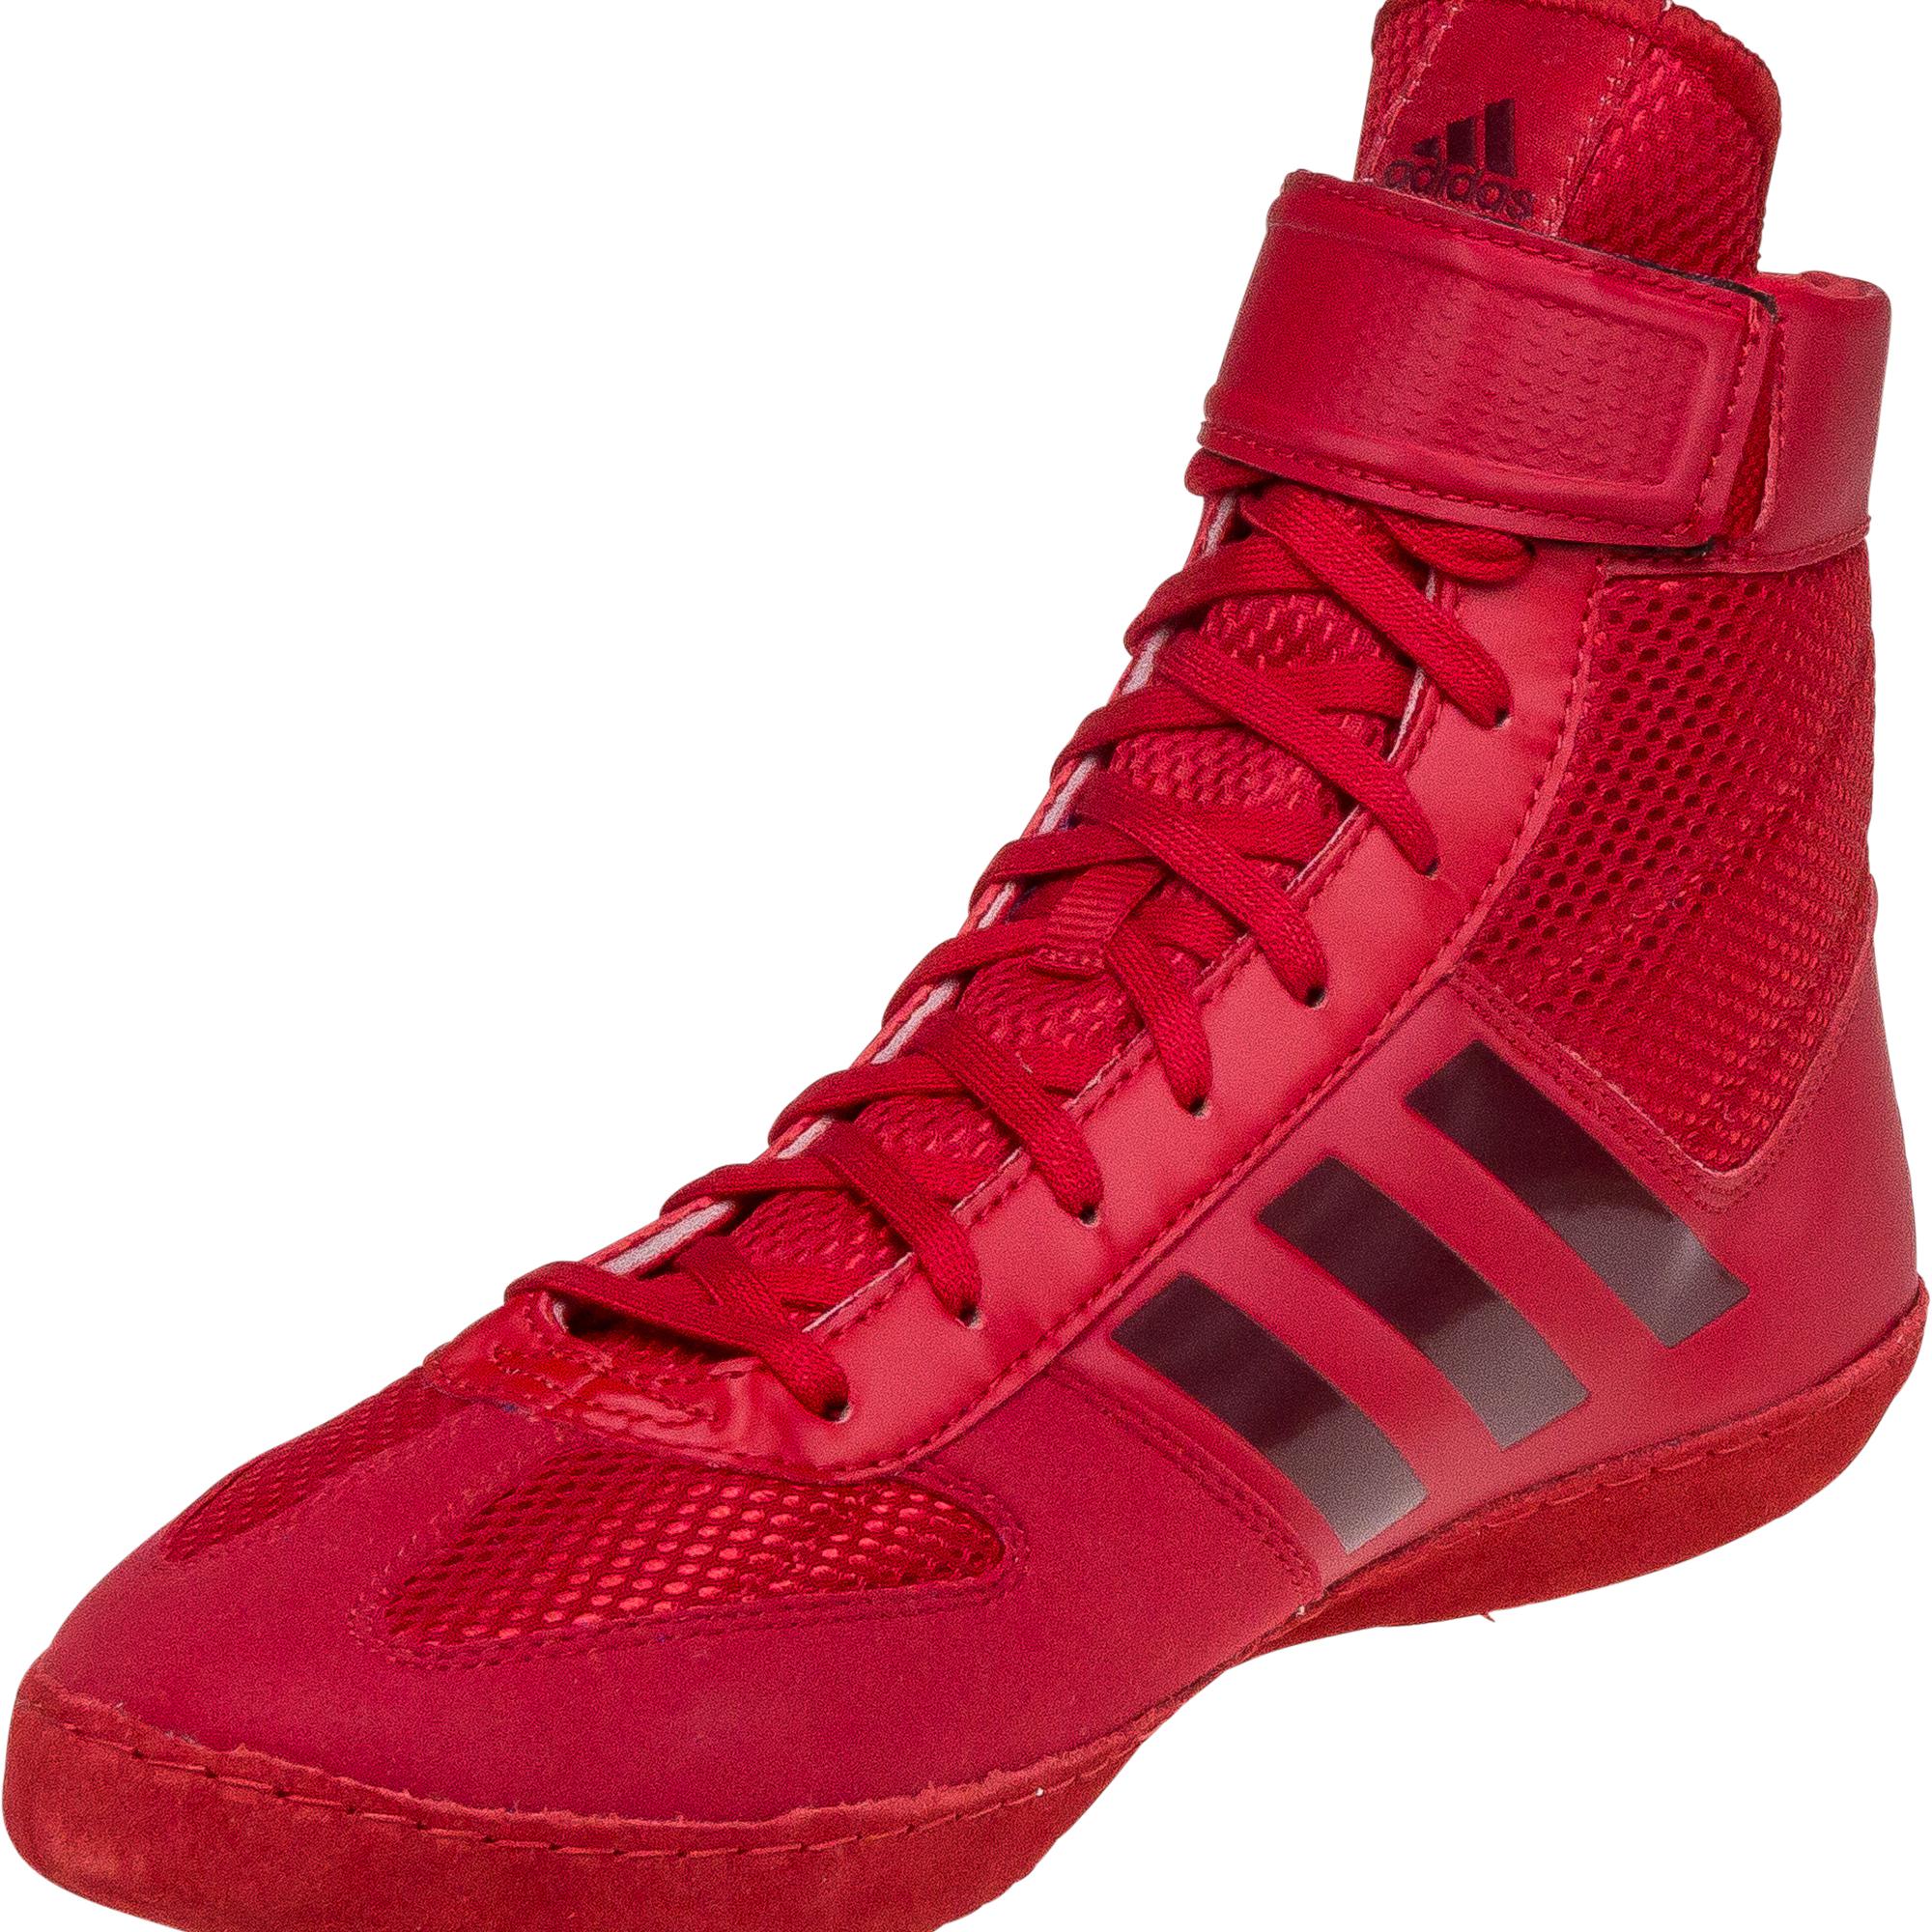 Adidas Combat Speed 5 Red   WrestlingGear